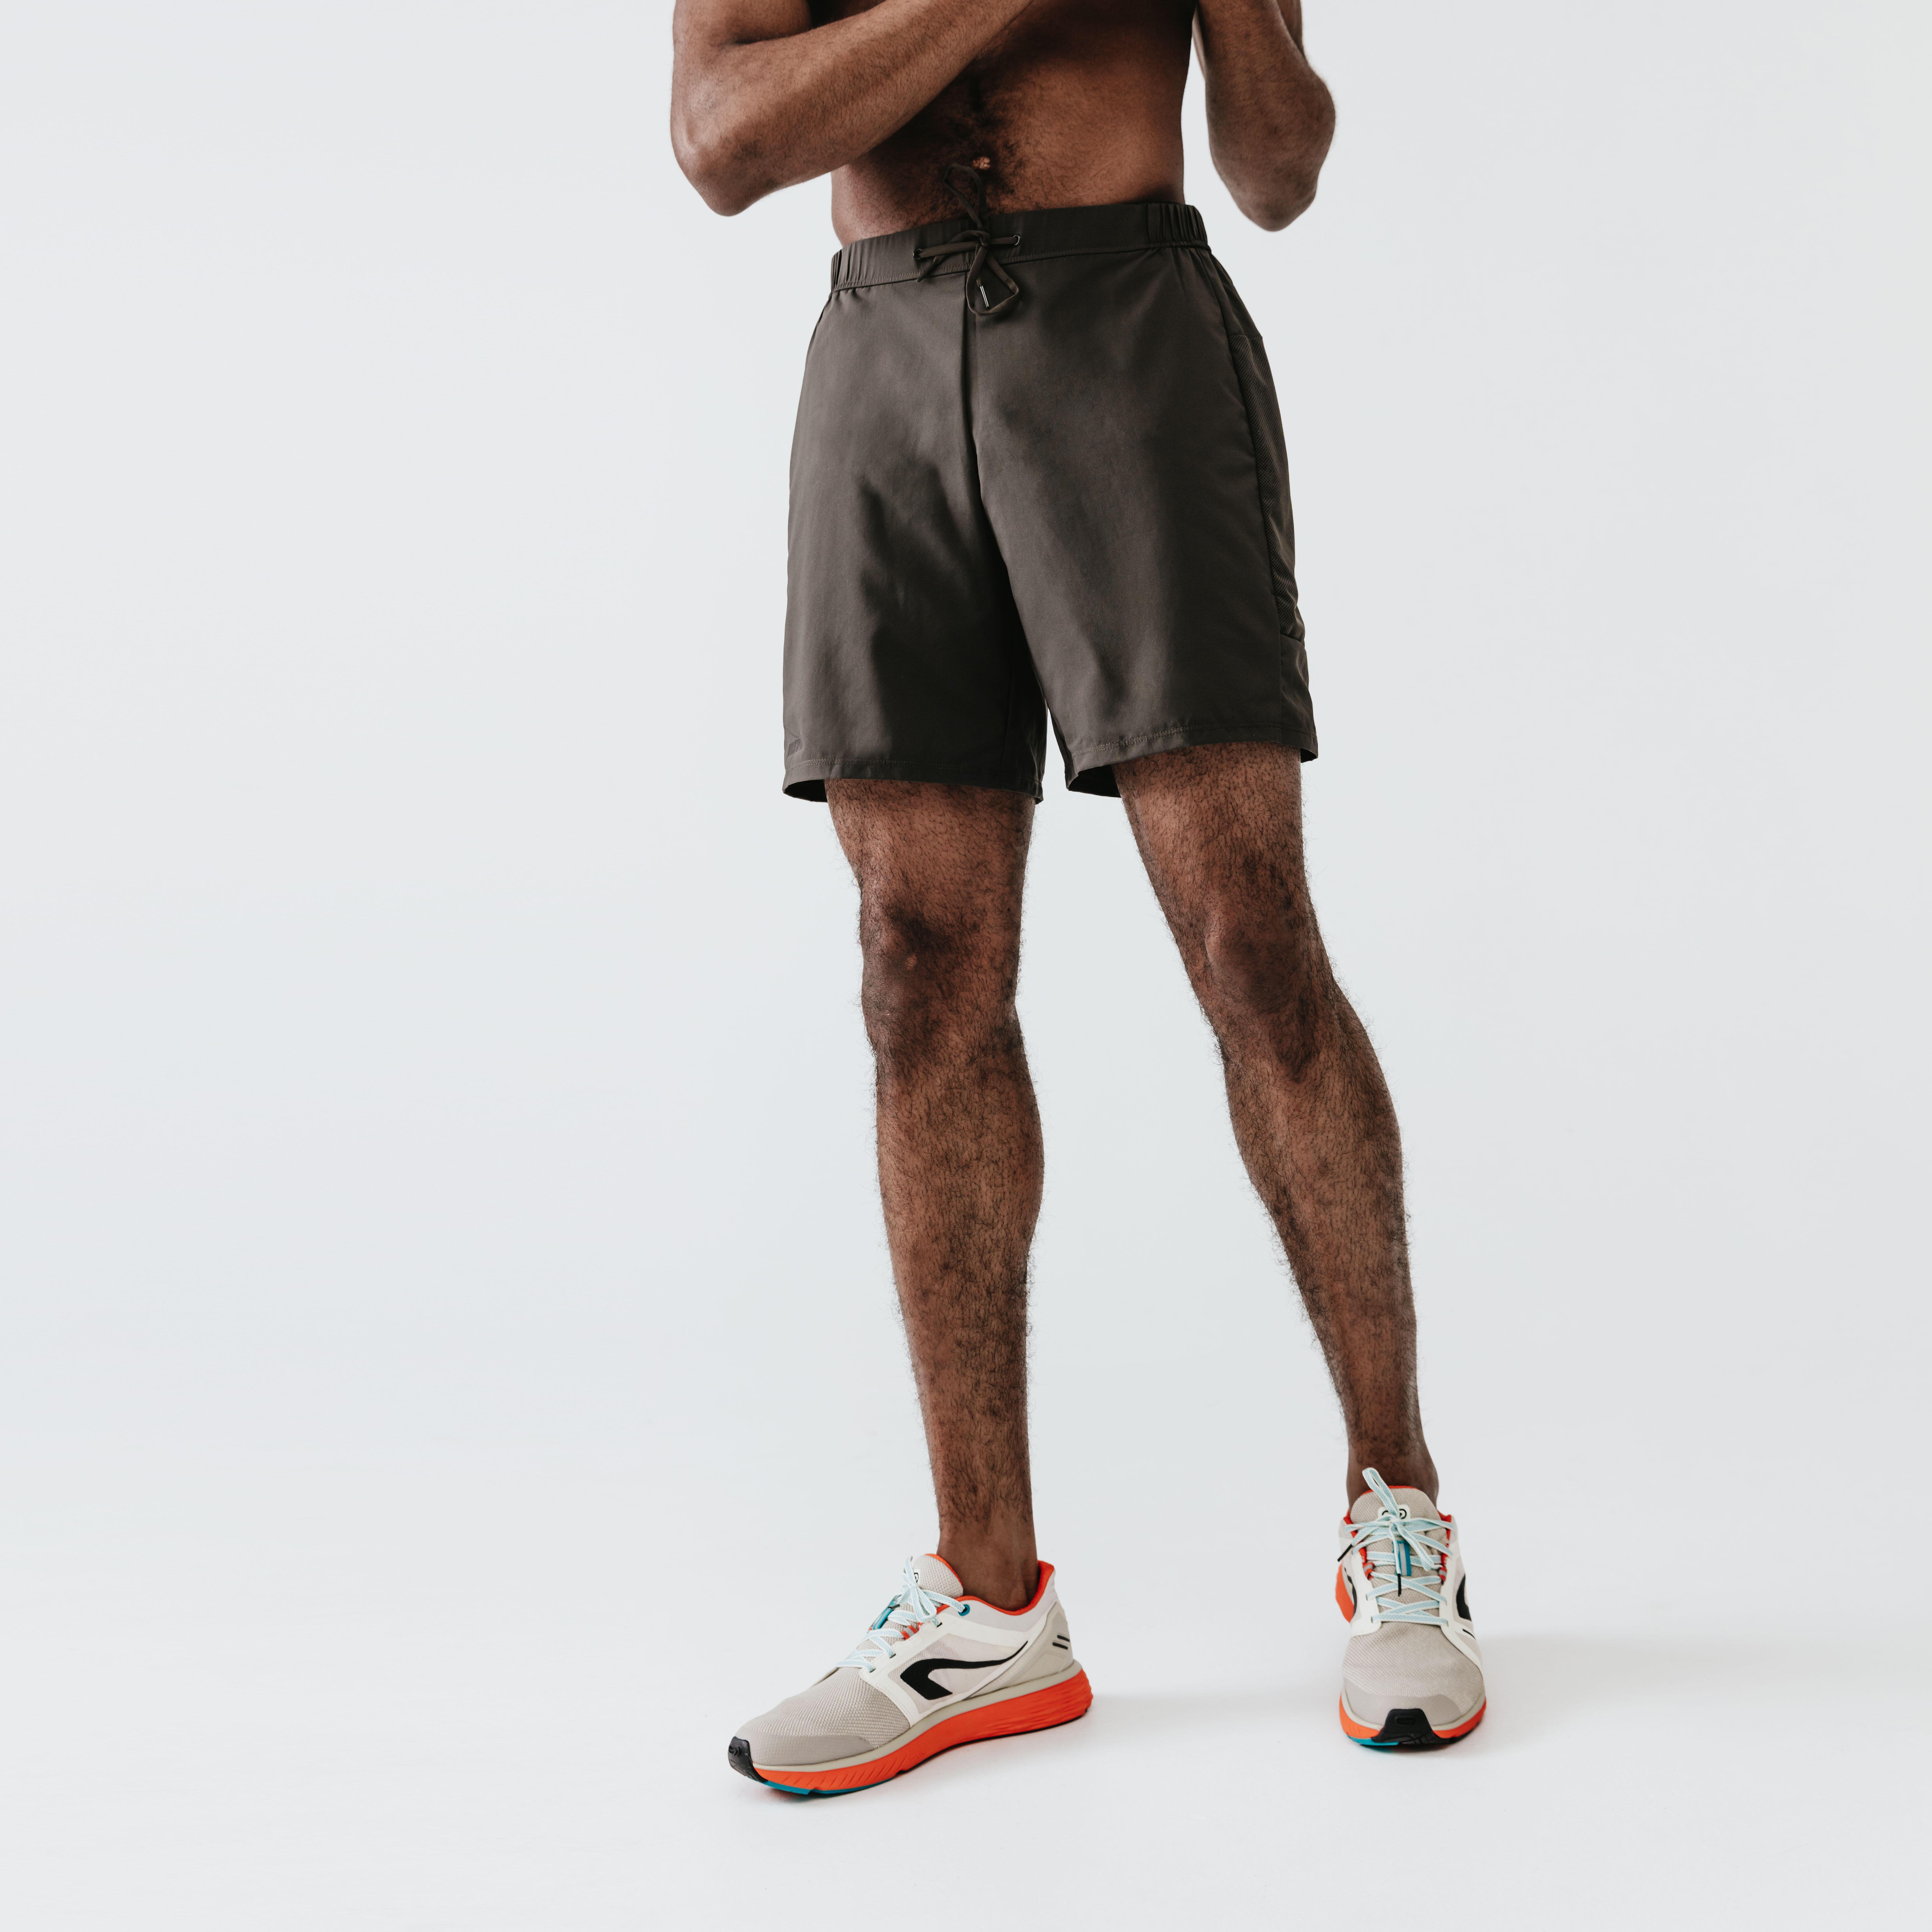 Șort Jogging DRY+ Bărbați imagine